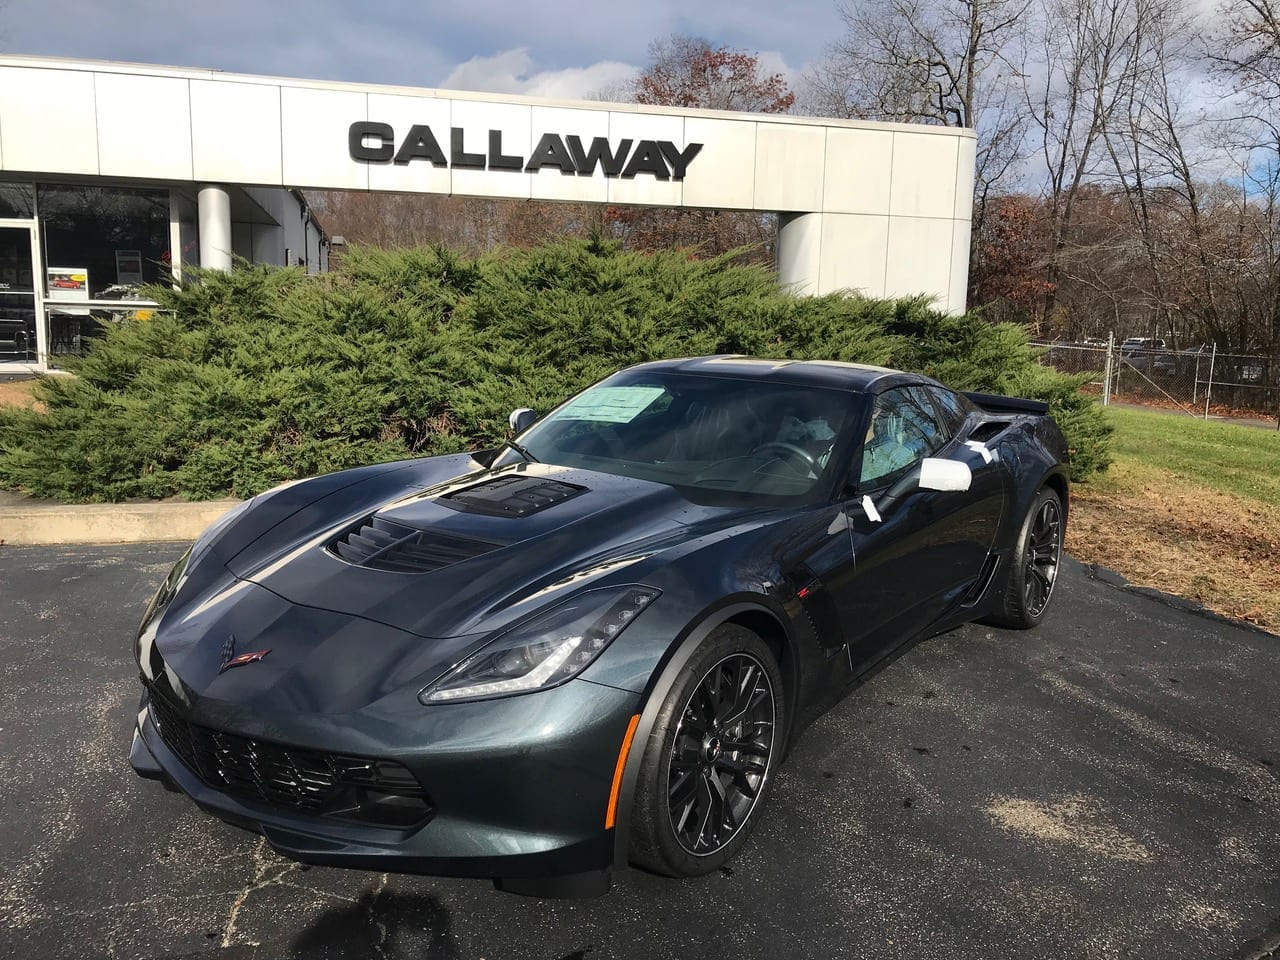 2019 Callaway Corvette Z06 SC757 - front